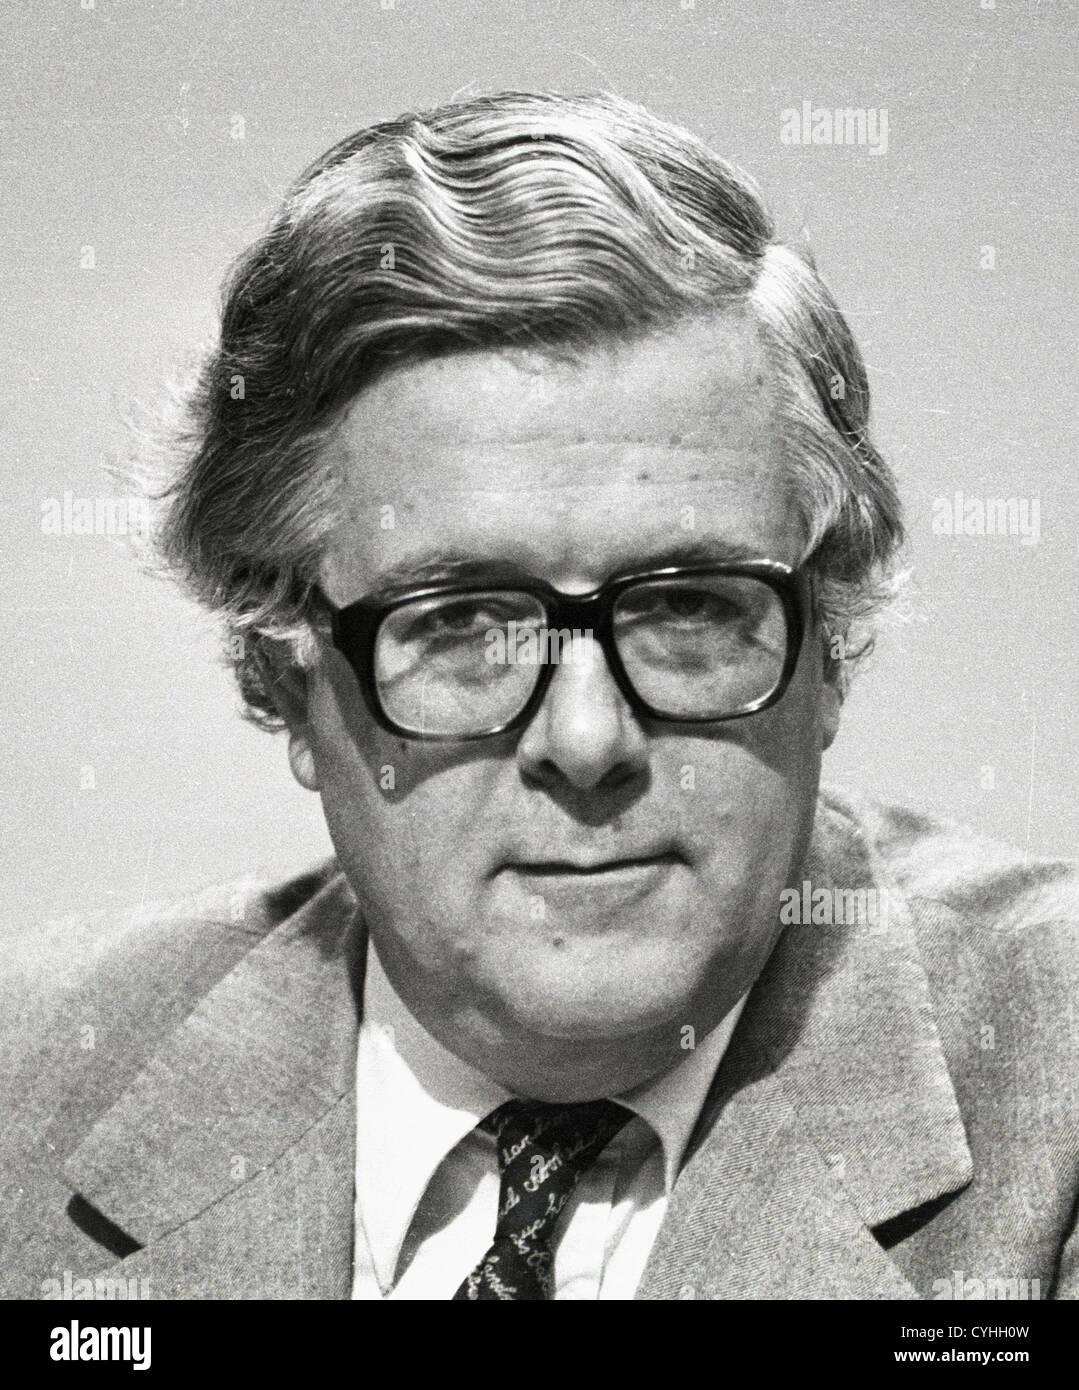 Richard Edward Geoffrey Howe Baron Howe of Aberavon CH QC PC known 1970-1992 as Sir Geoffrey Howe is a former British - Stock Image